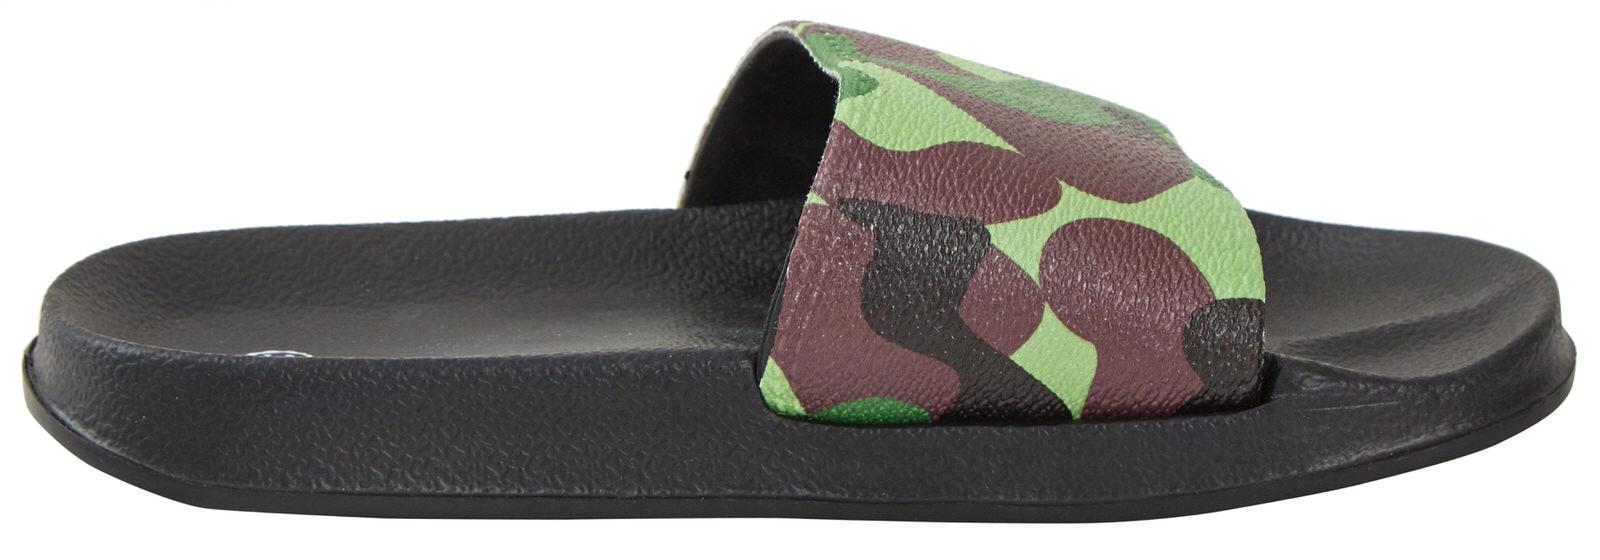 Boys Camouflage Lightweight Sliders Summer Pool Beach Flip Flops Shower Shoes